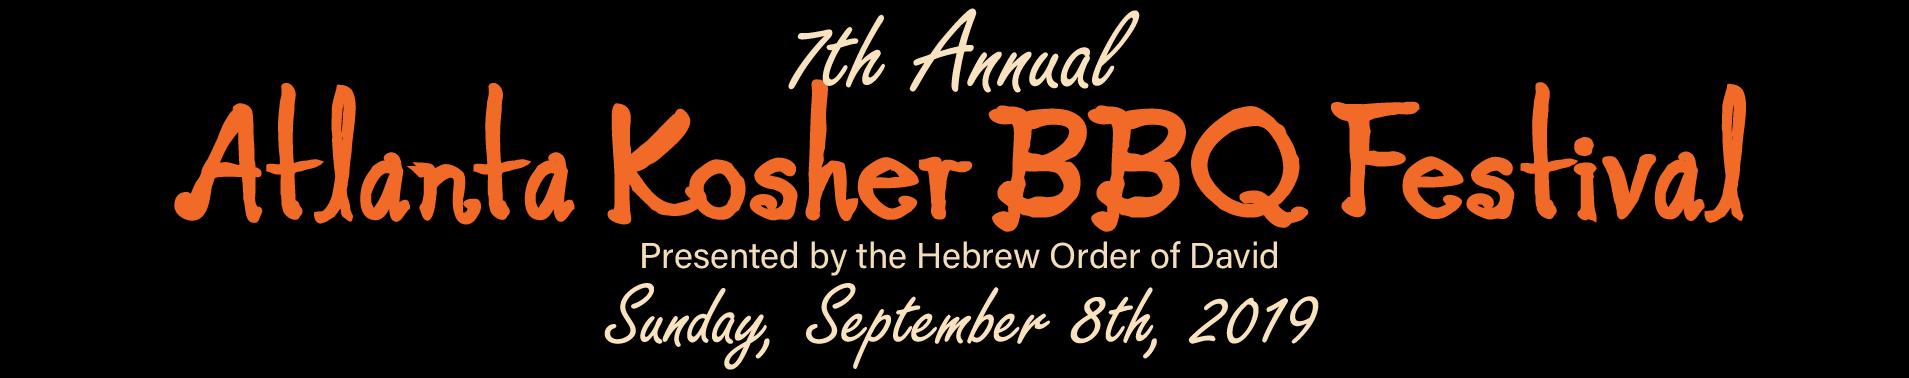 Annual Atlanta Kosher BBQ Festival   Bringing the Community Together!